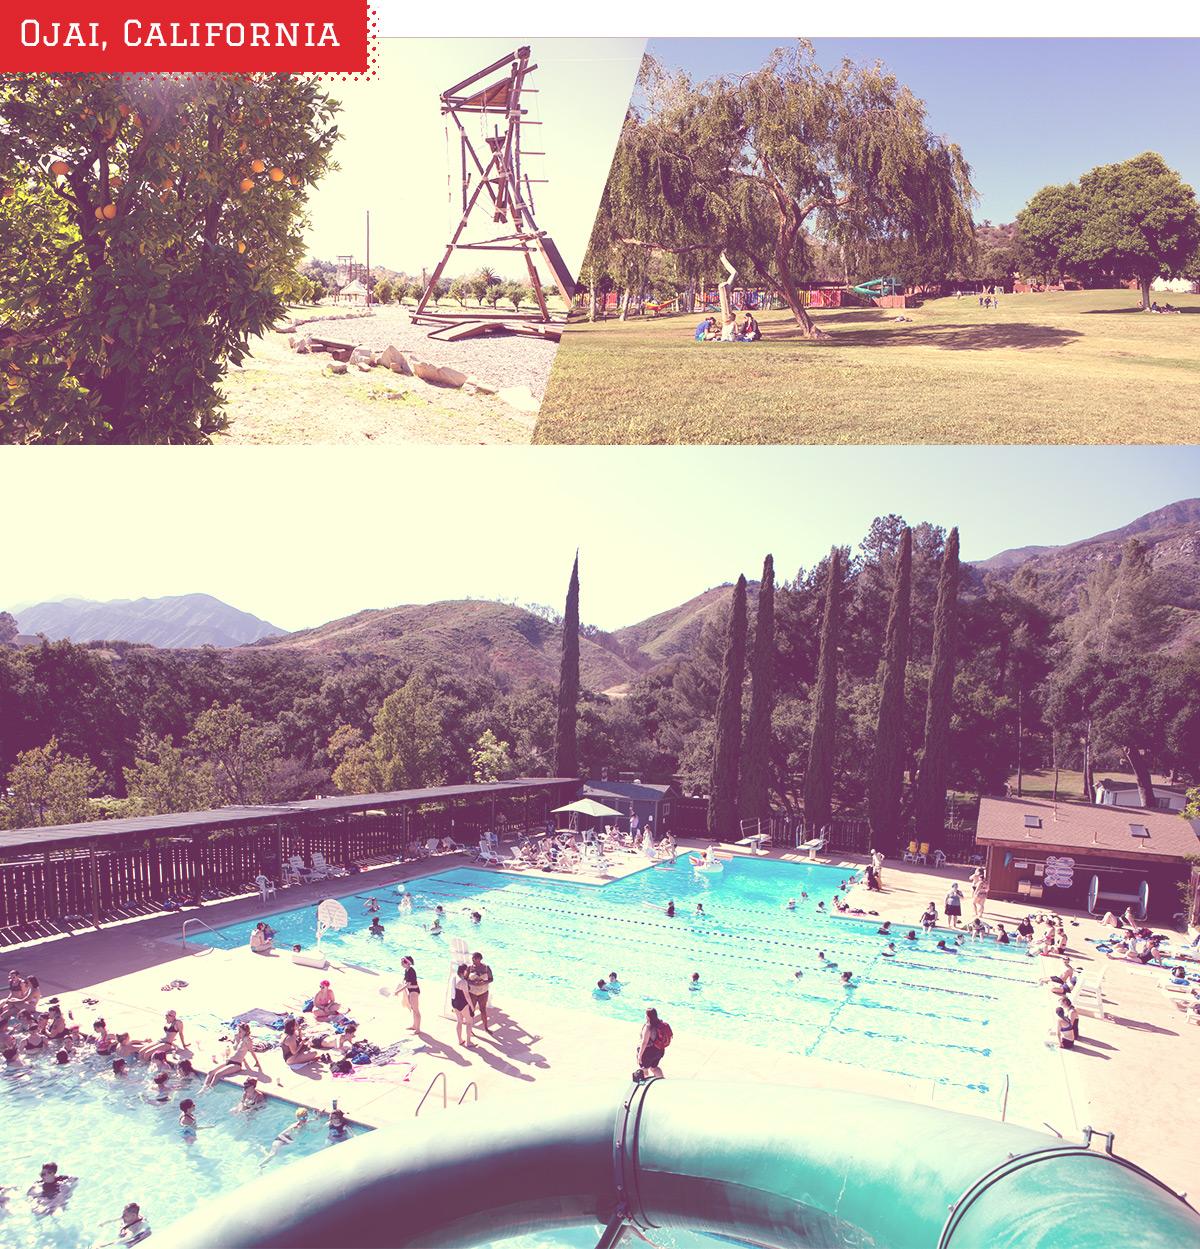 ojai california - photos of site